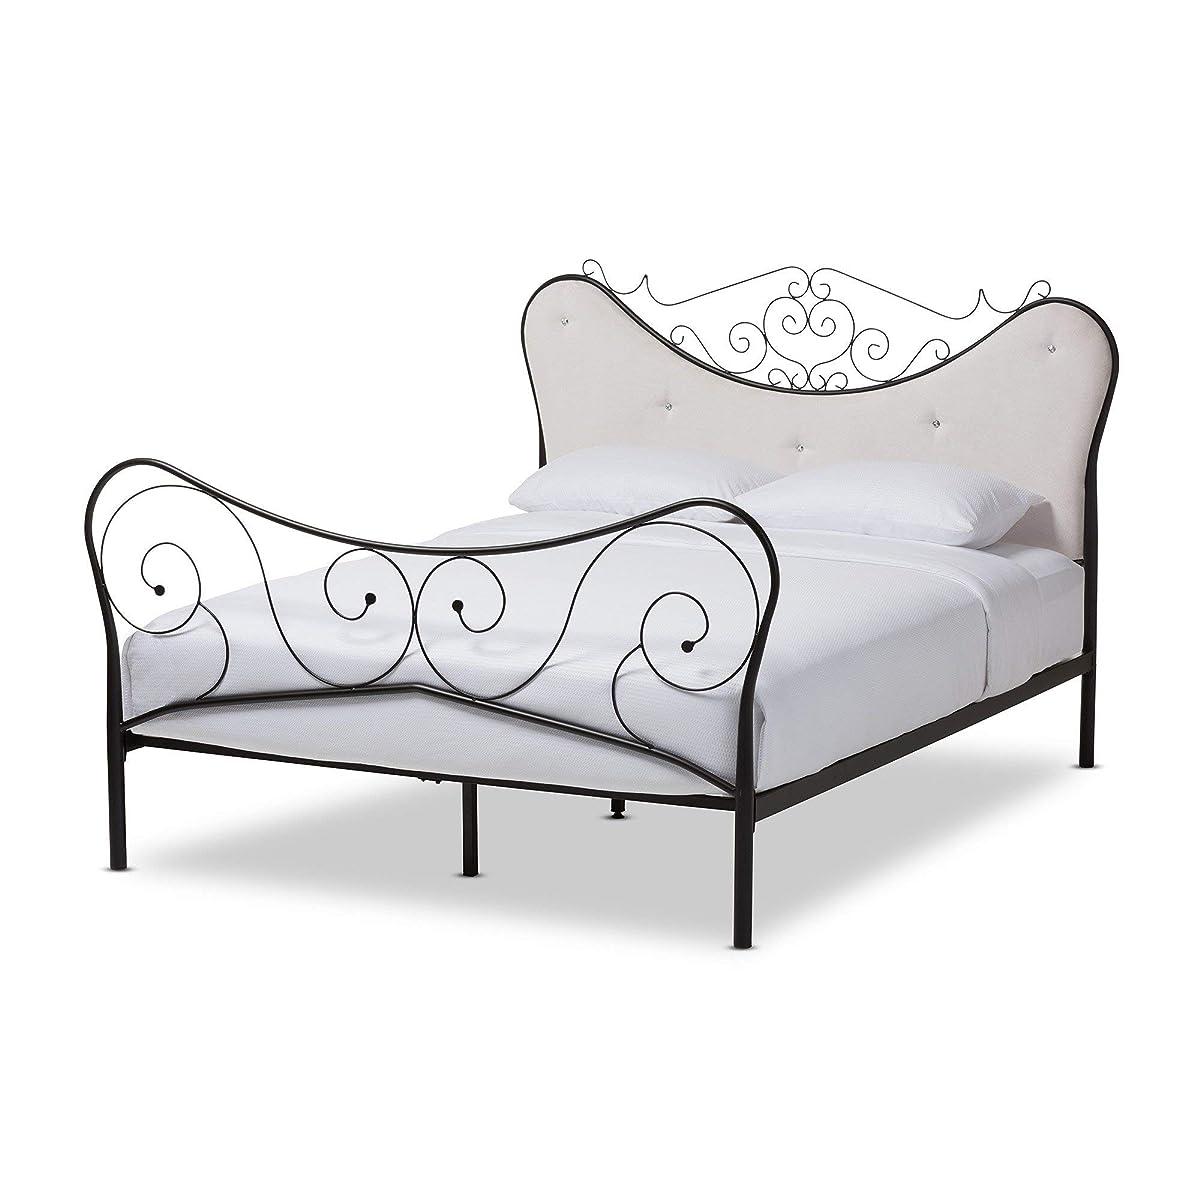 Baxton StudioAlanna Queen Size Chic Metal Platform Bed with Beige Tufted Headboard